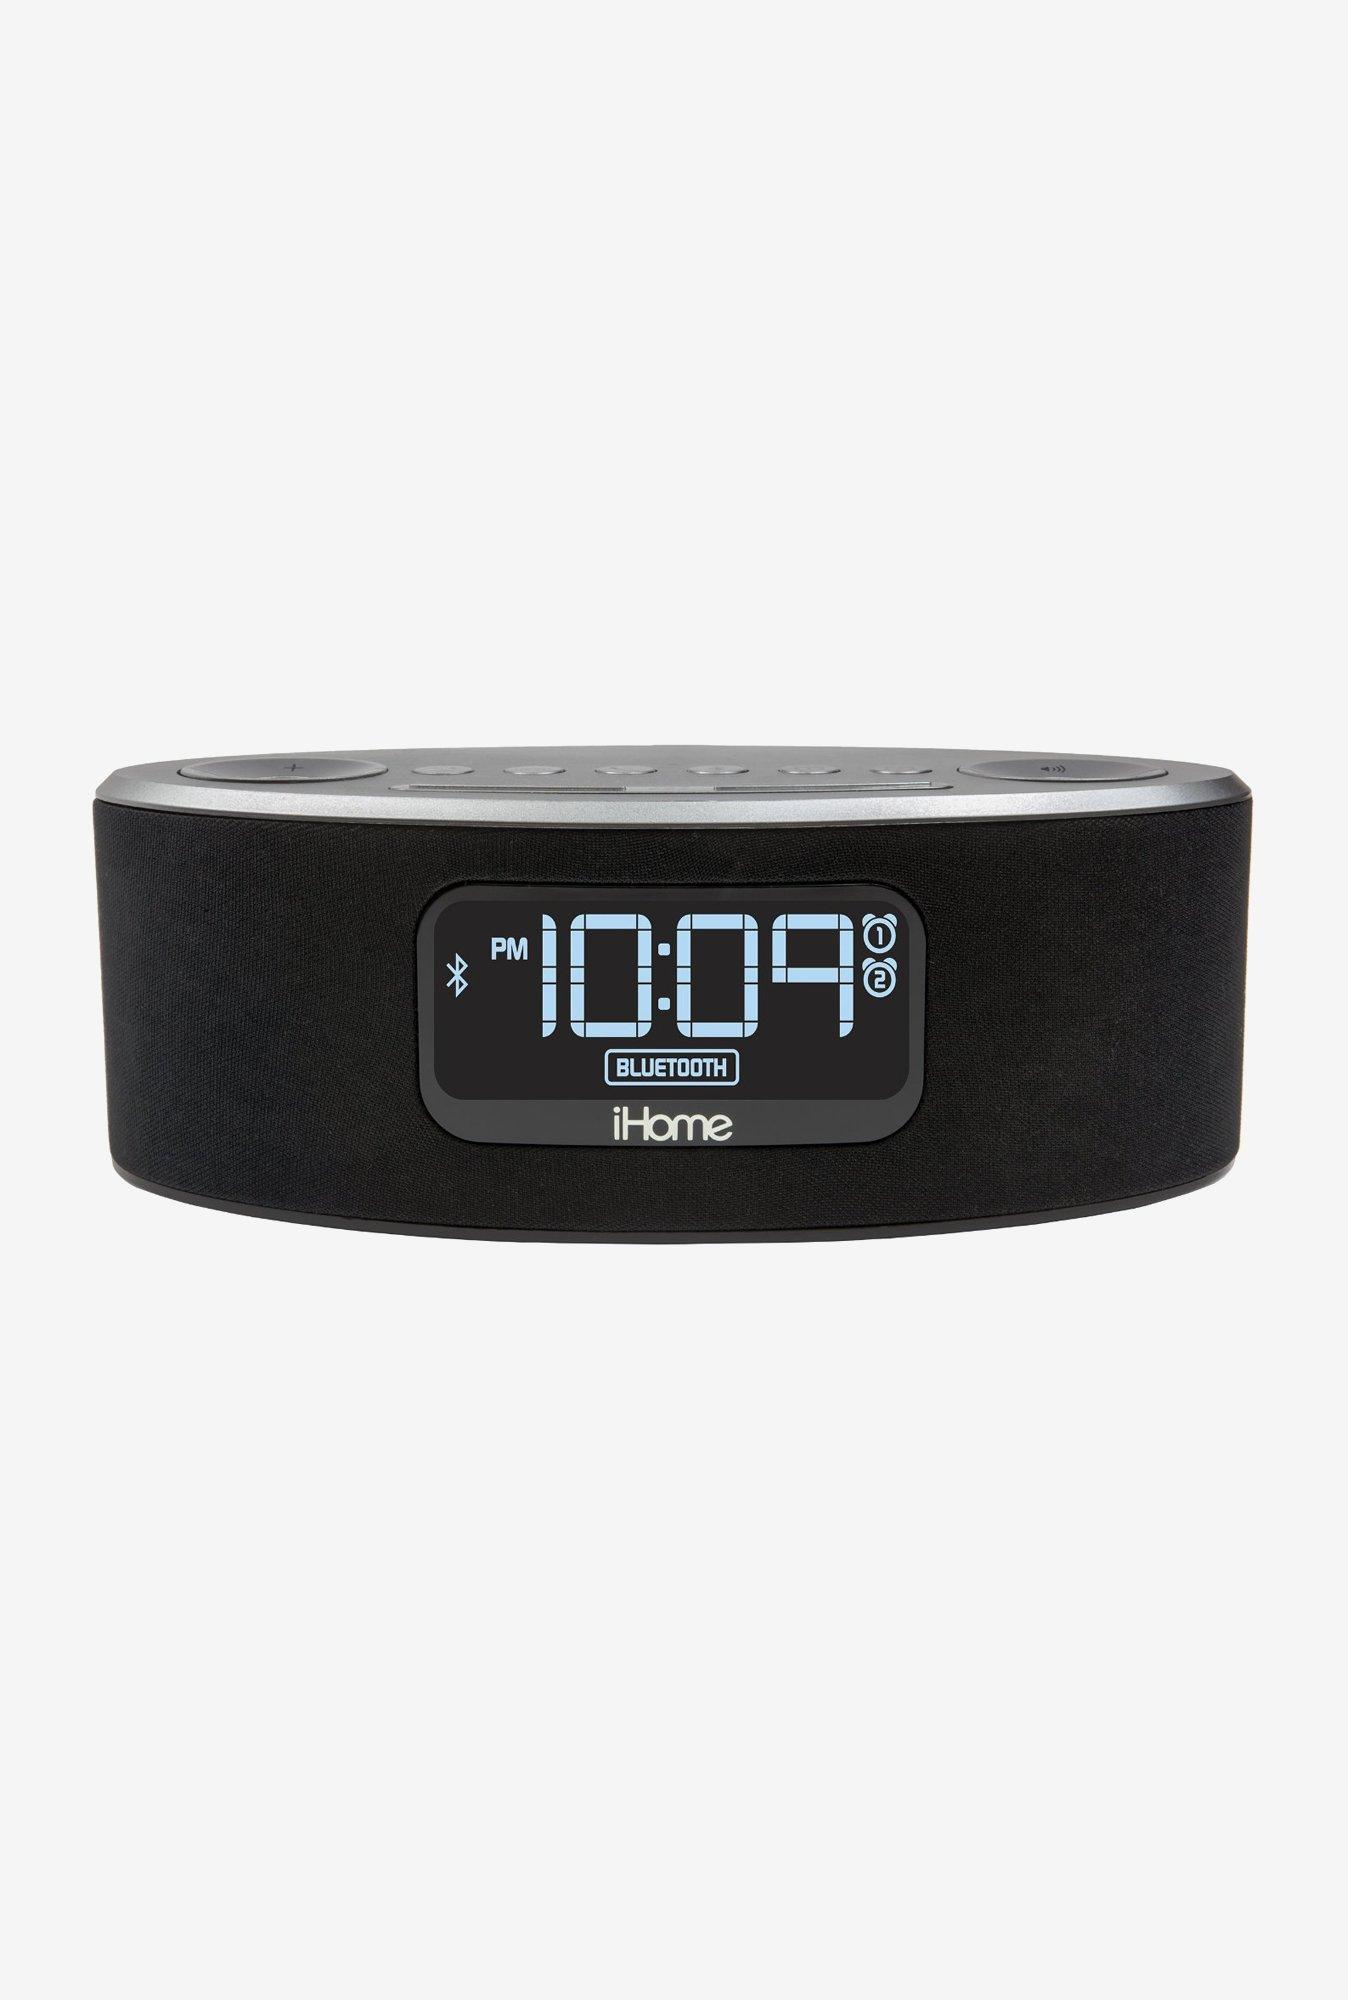 Buy iHome iBT31 Bluetooth Speaker with FM Clock Radio (Black